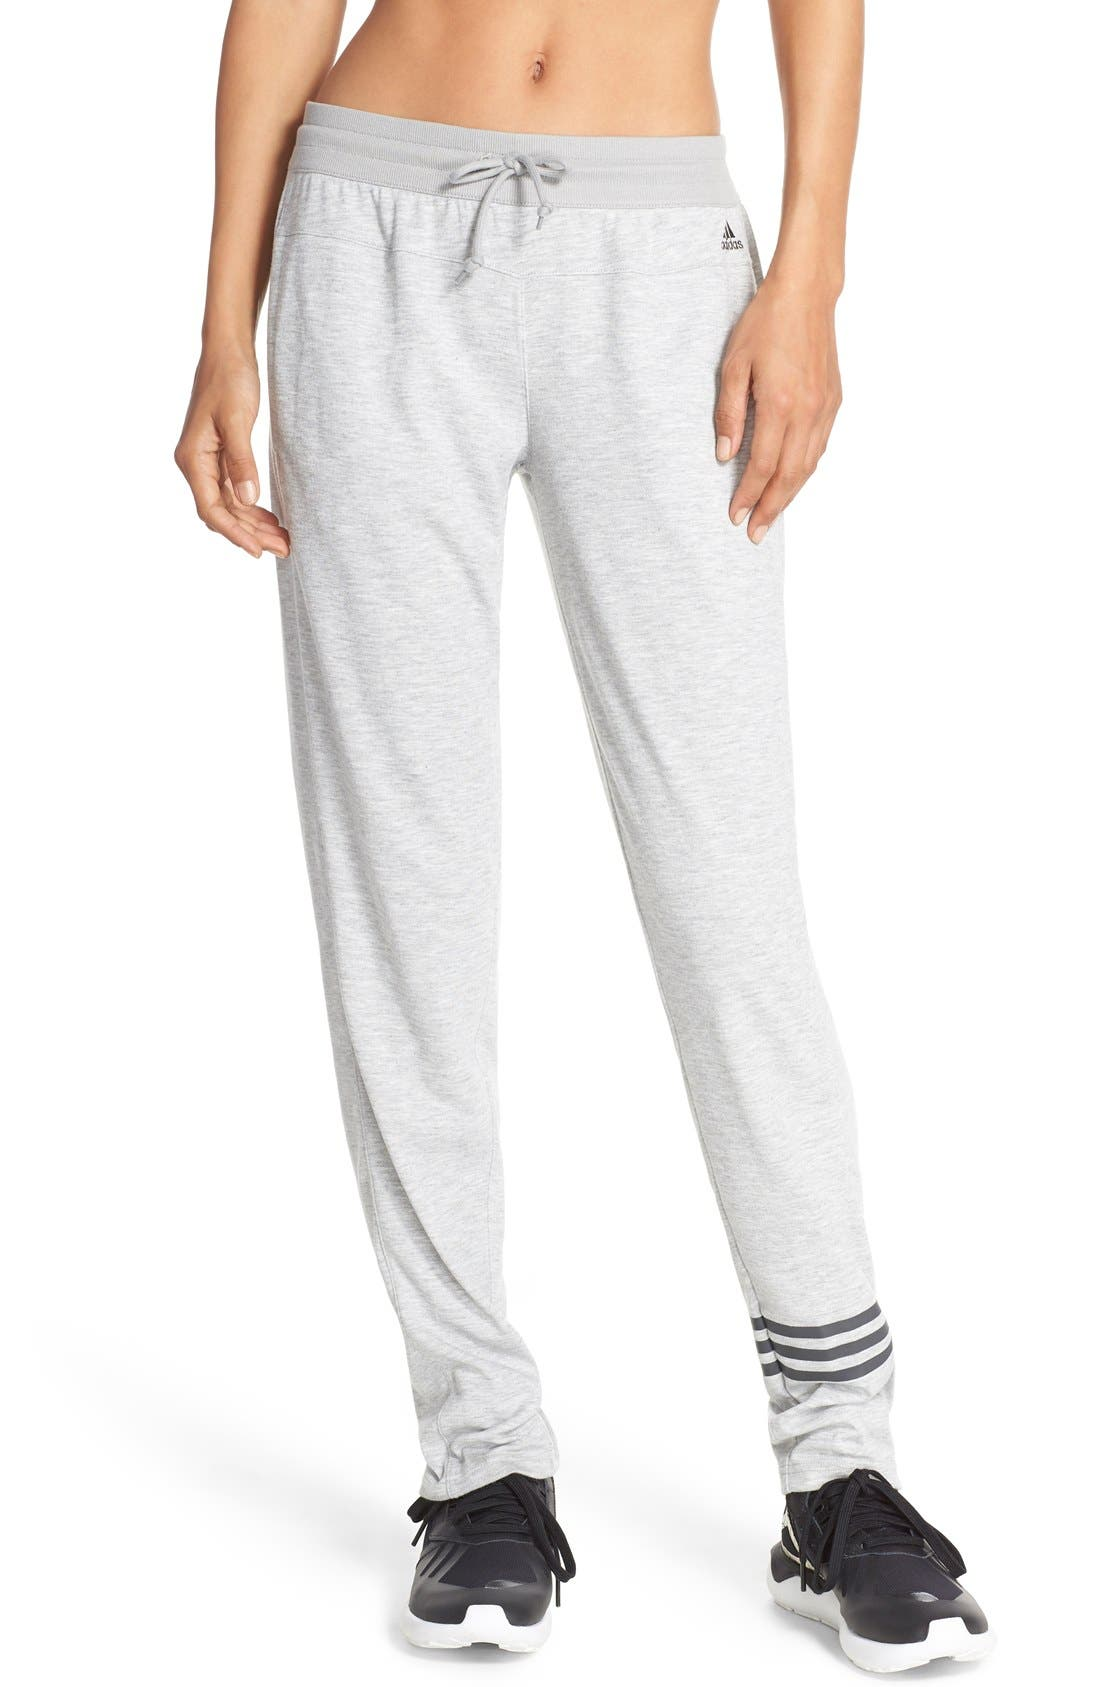 Alternate Image 1 Selected - adidas '2Love' Tapered Sweatpants